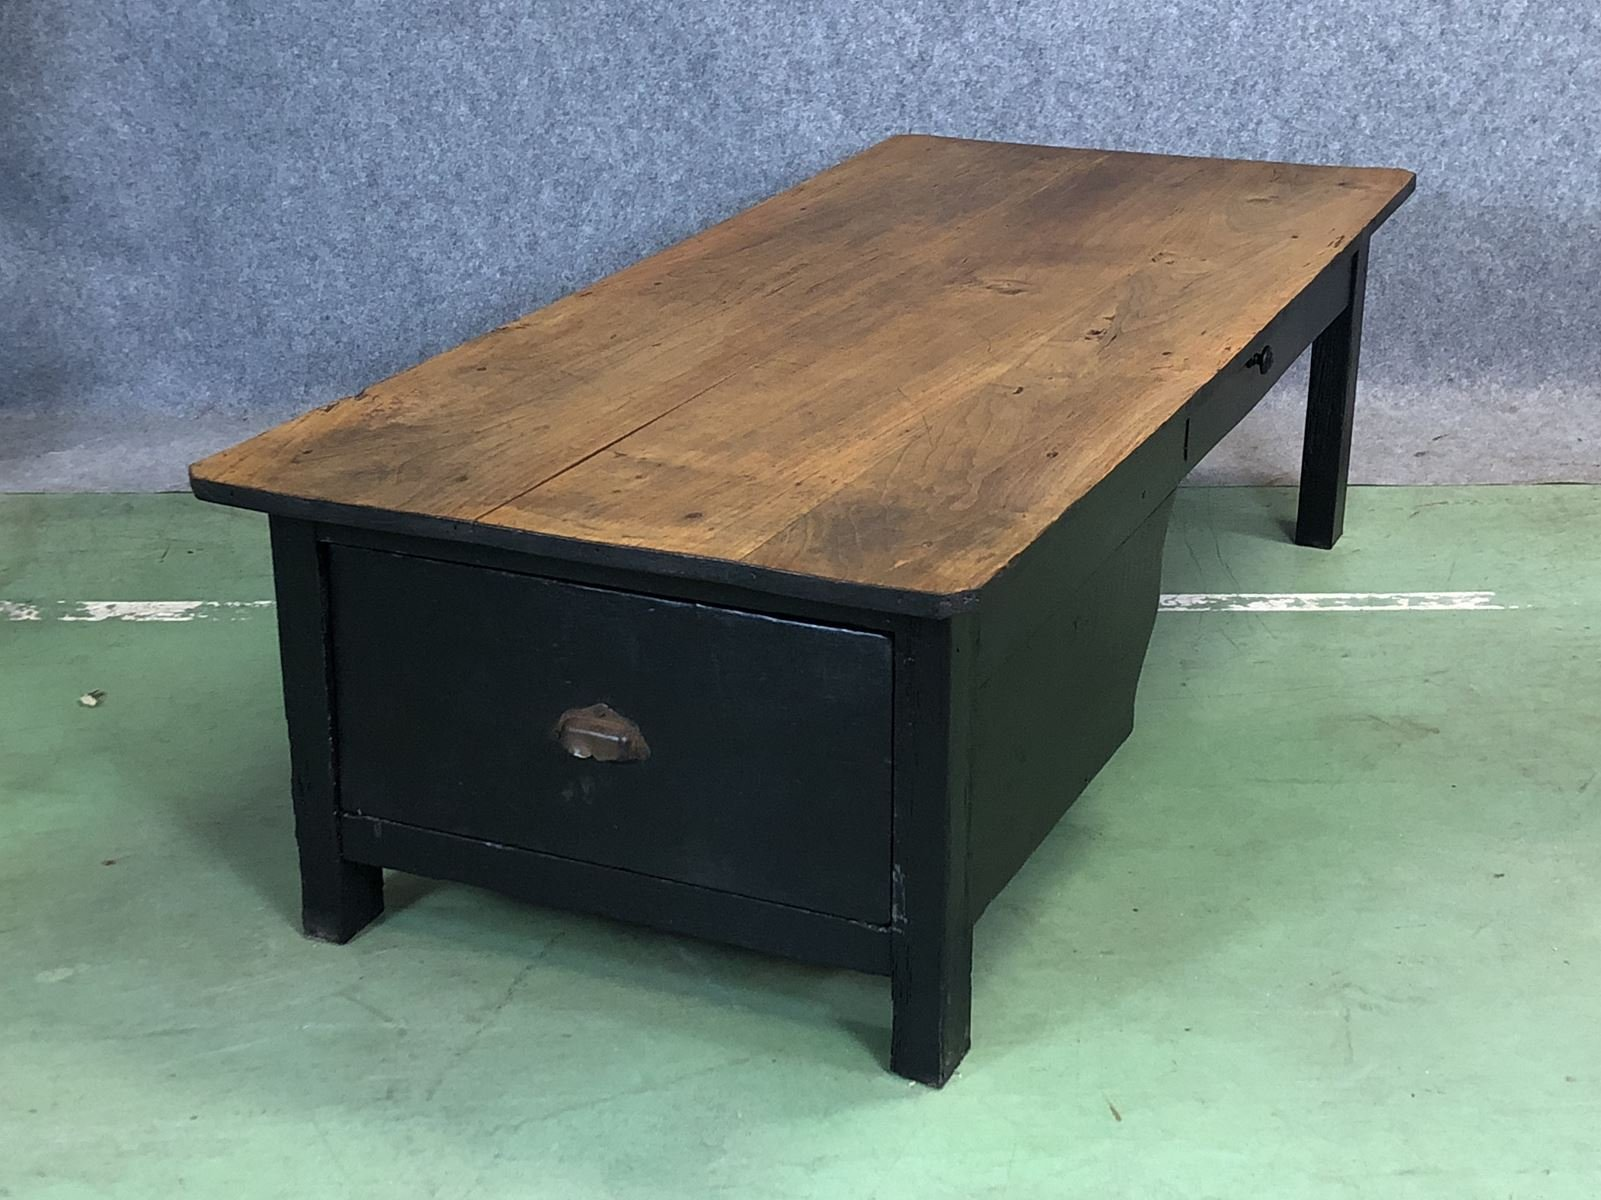 Merveilleux Vintage Rustic Chestnut Coffee Table